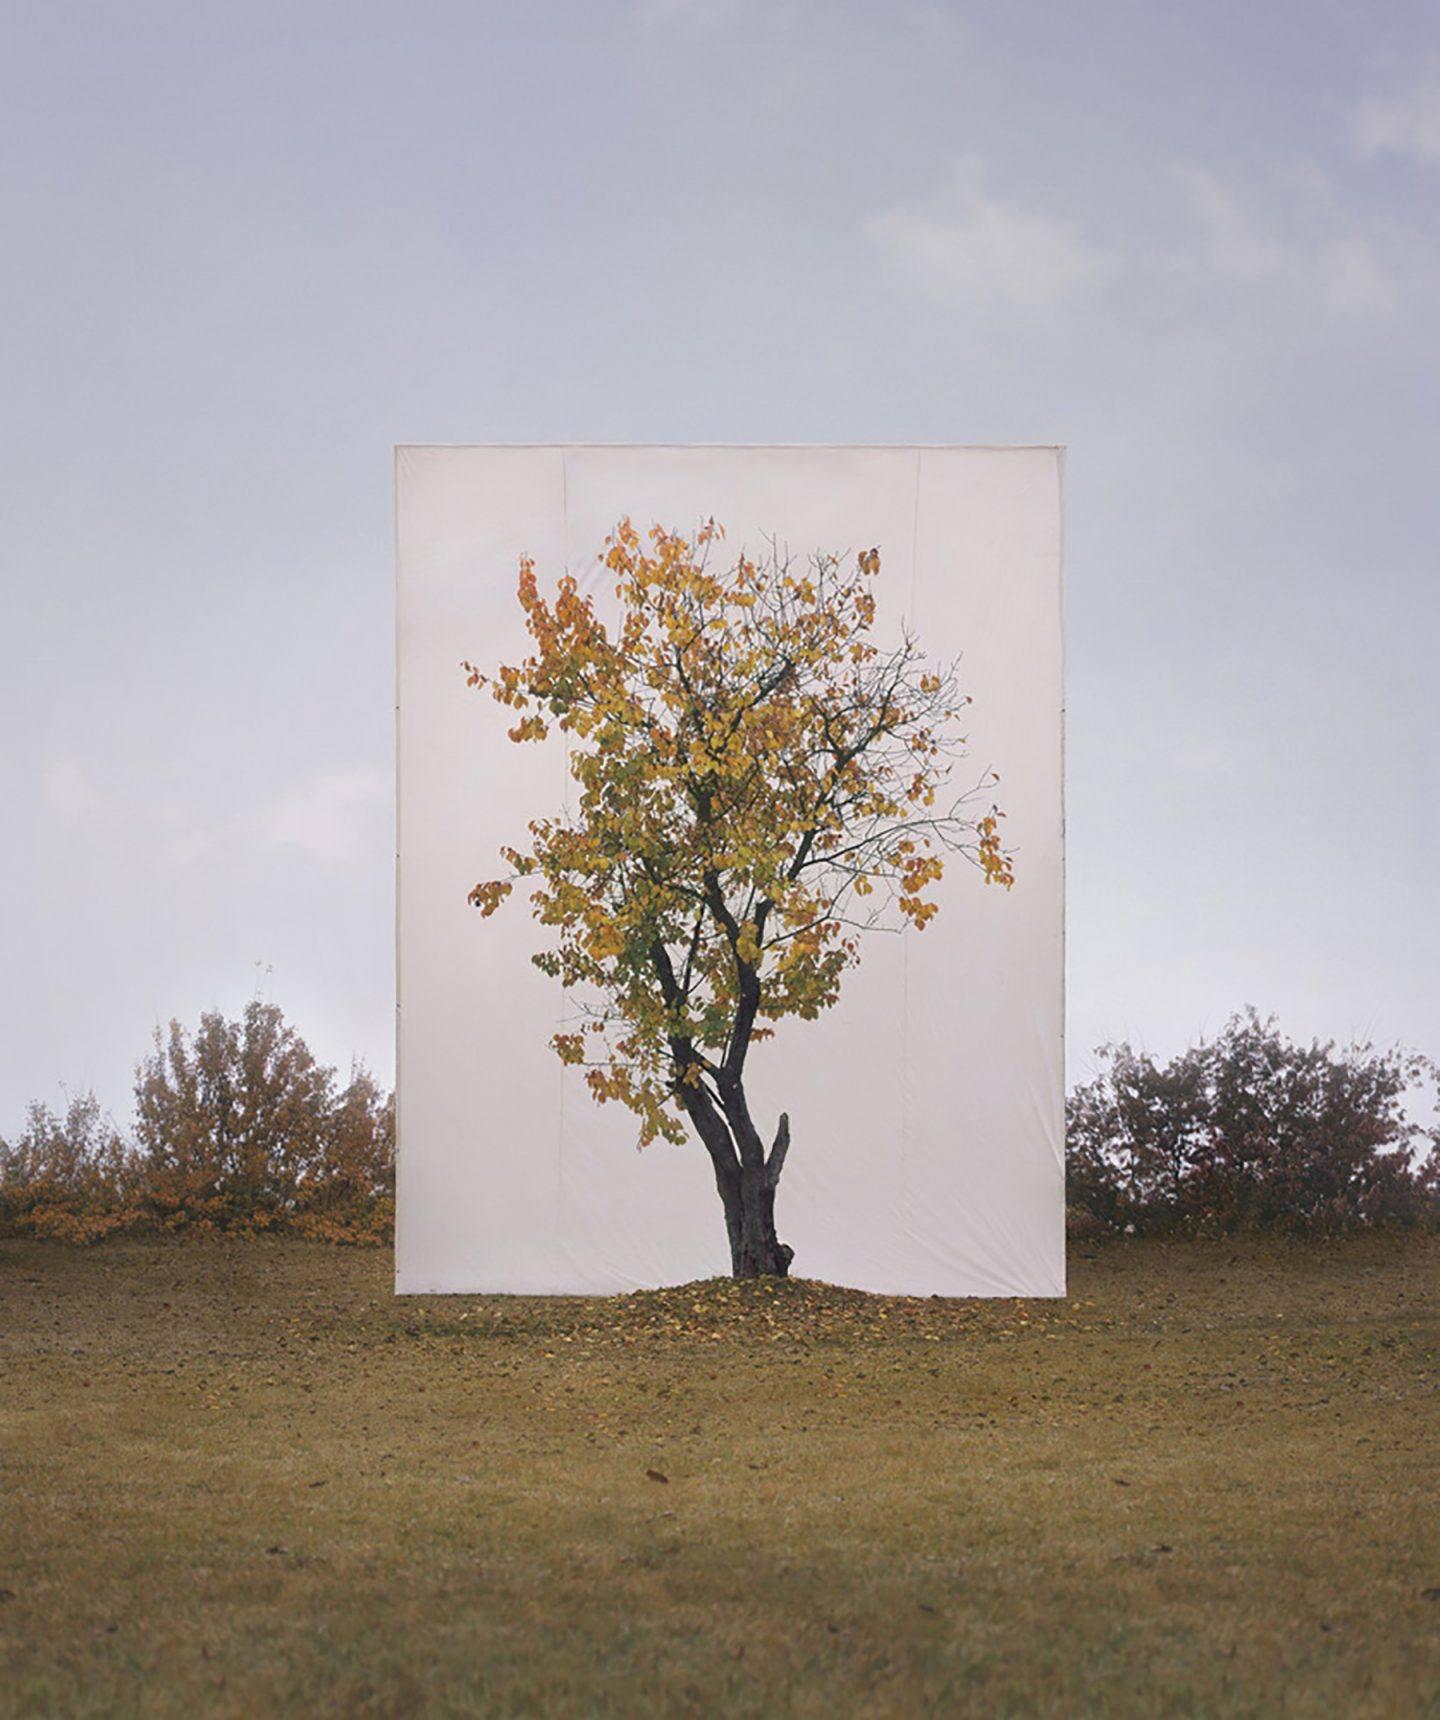 Tree, Myoung Ho Lee cattura la bellezza della natura | Collater.al 1